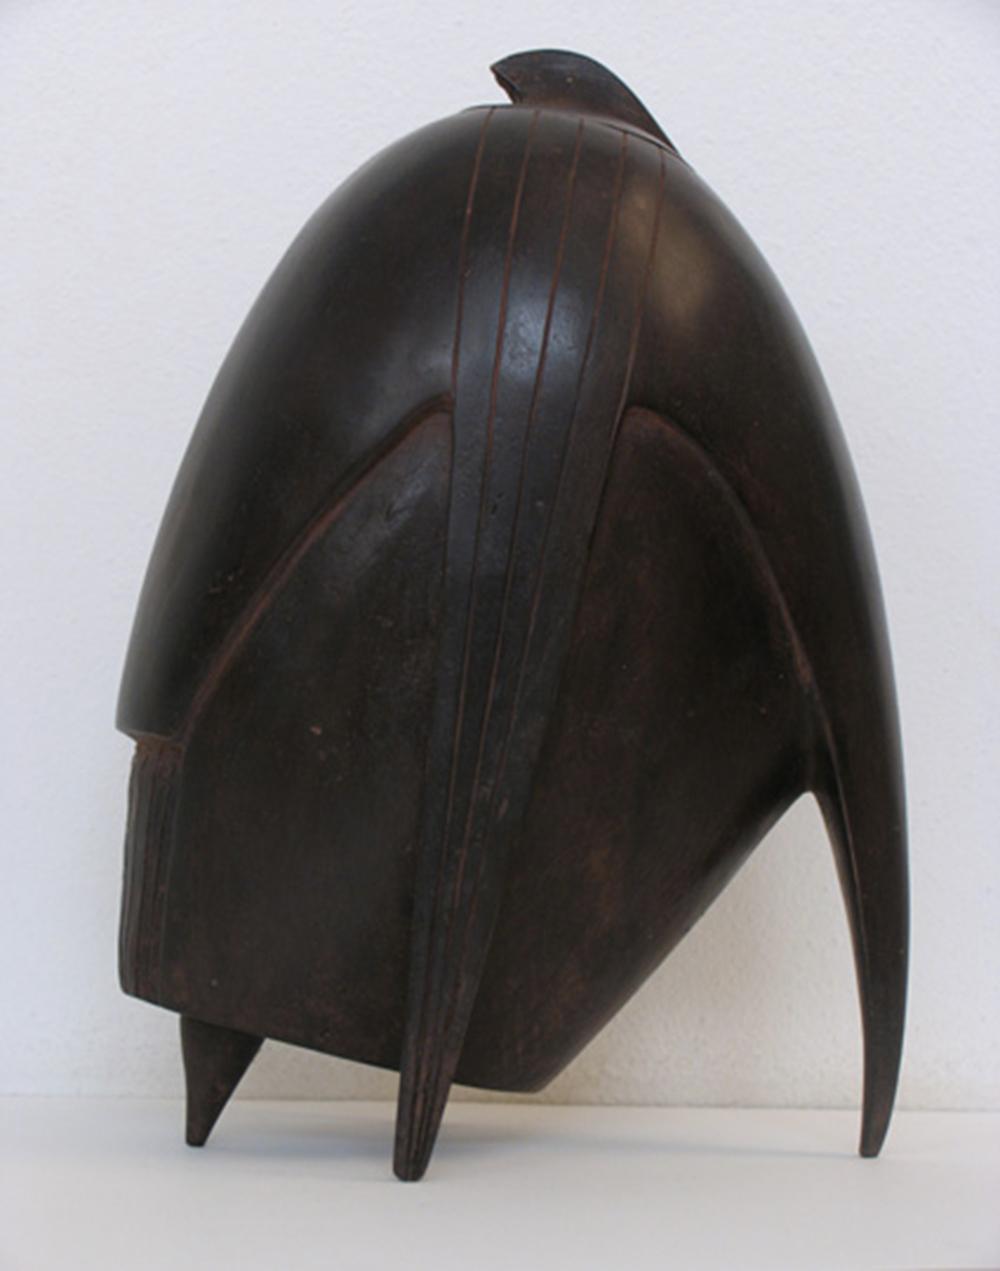 Tueio, 2006, bronzo, cm 22x32x15 circa